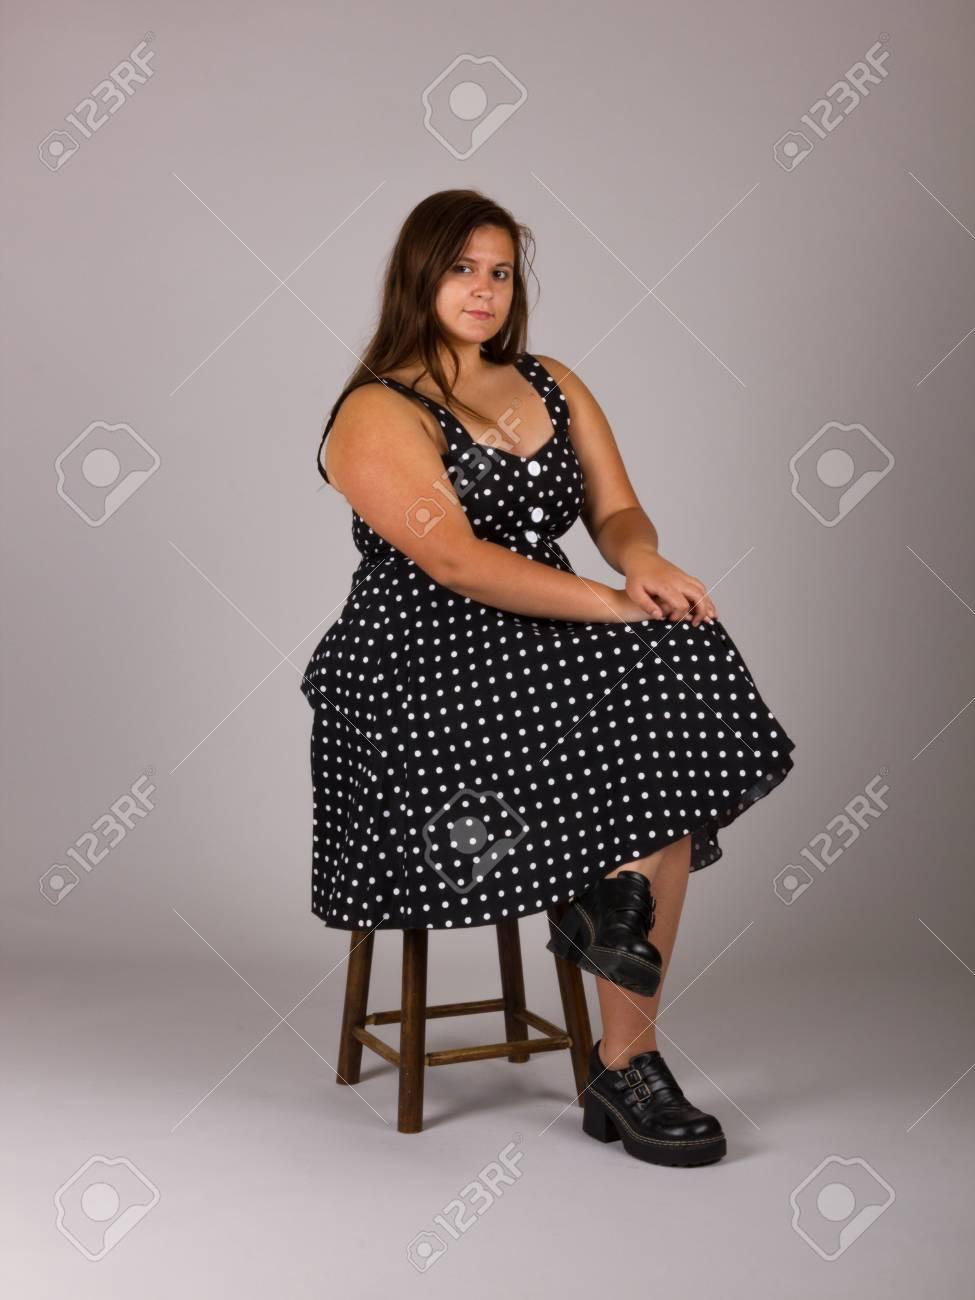 3c4728936ac6b Beautiful Curvy Teenage Girl in Polkadot Dress and Black Shoes Stock Photo  - 95295686